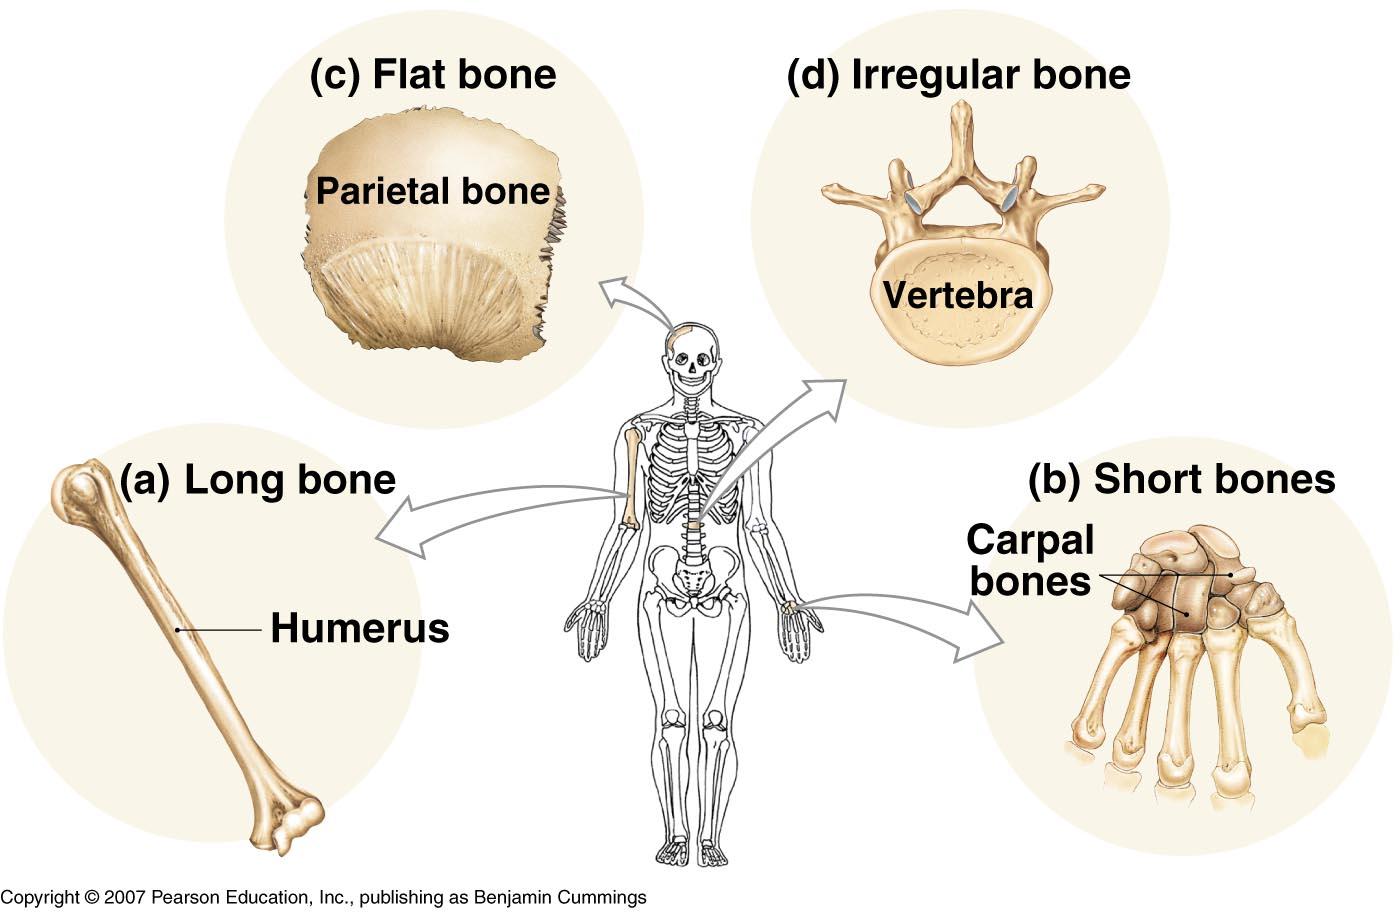 32 Label The Long Bone